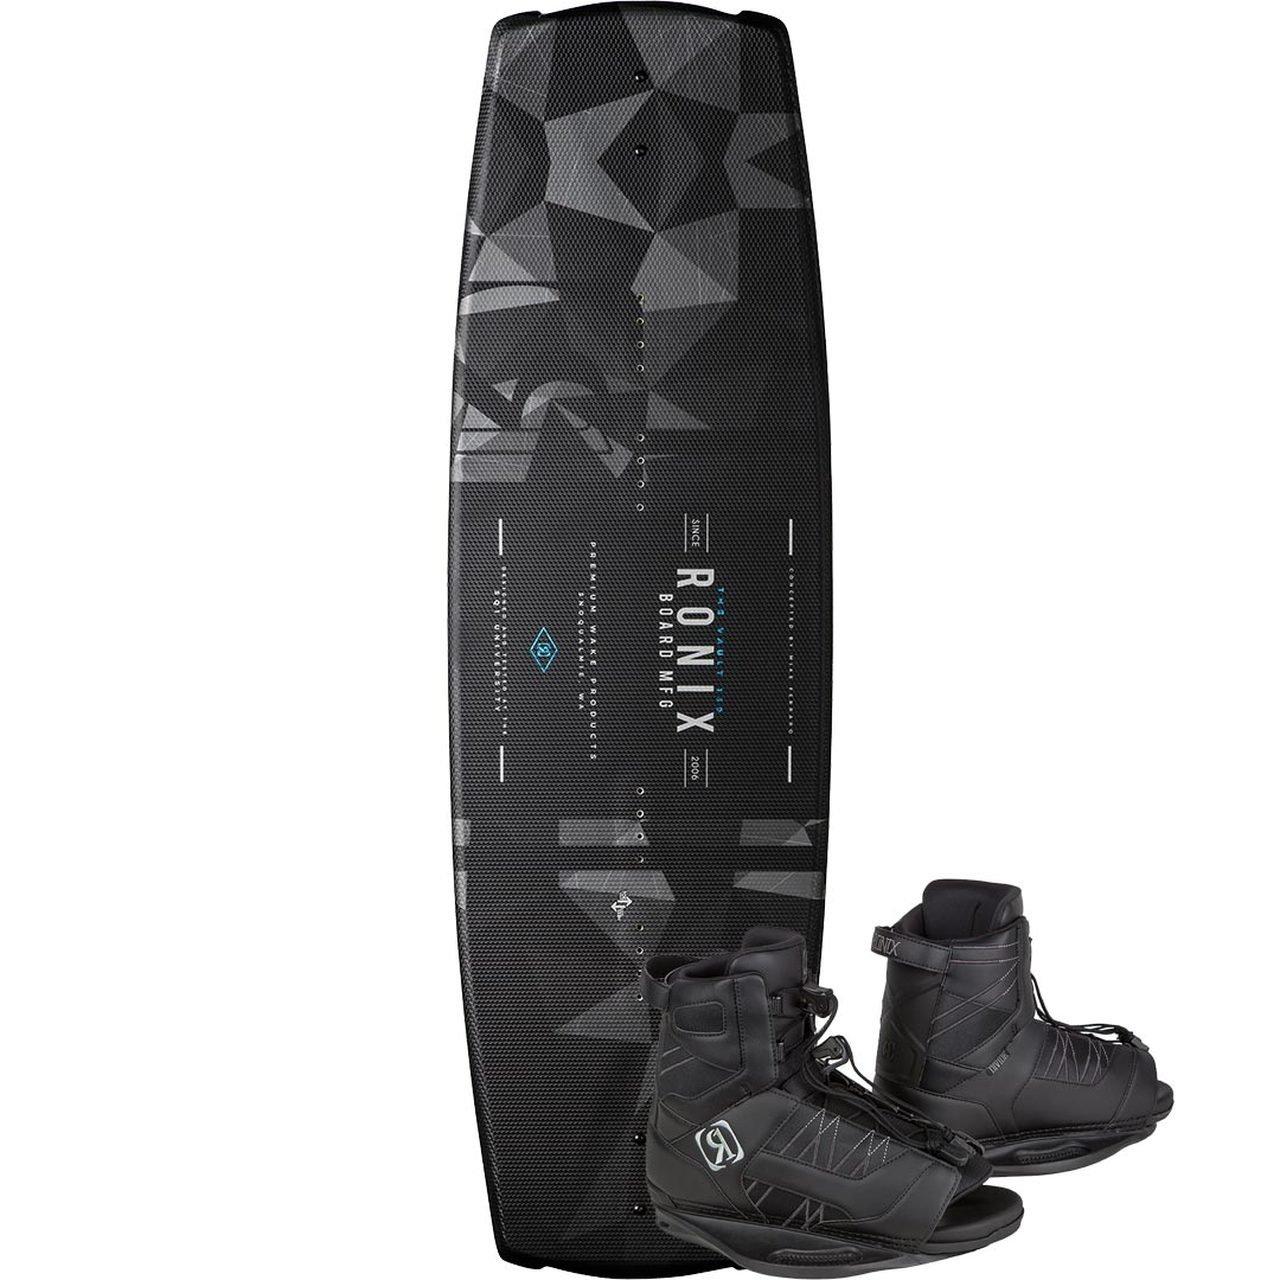 Ronix Vault 134 Combo w/ Divide 5-8.5 Boots